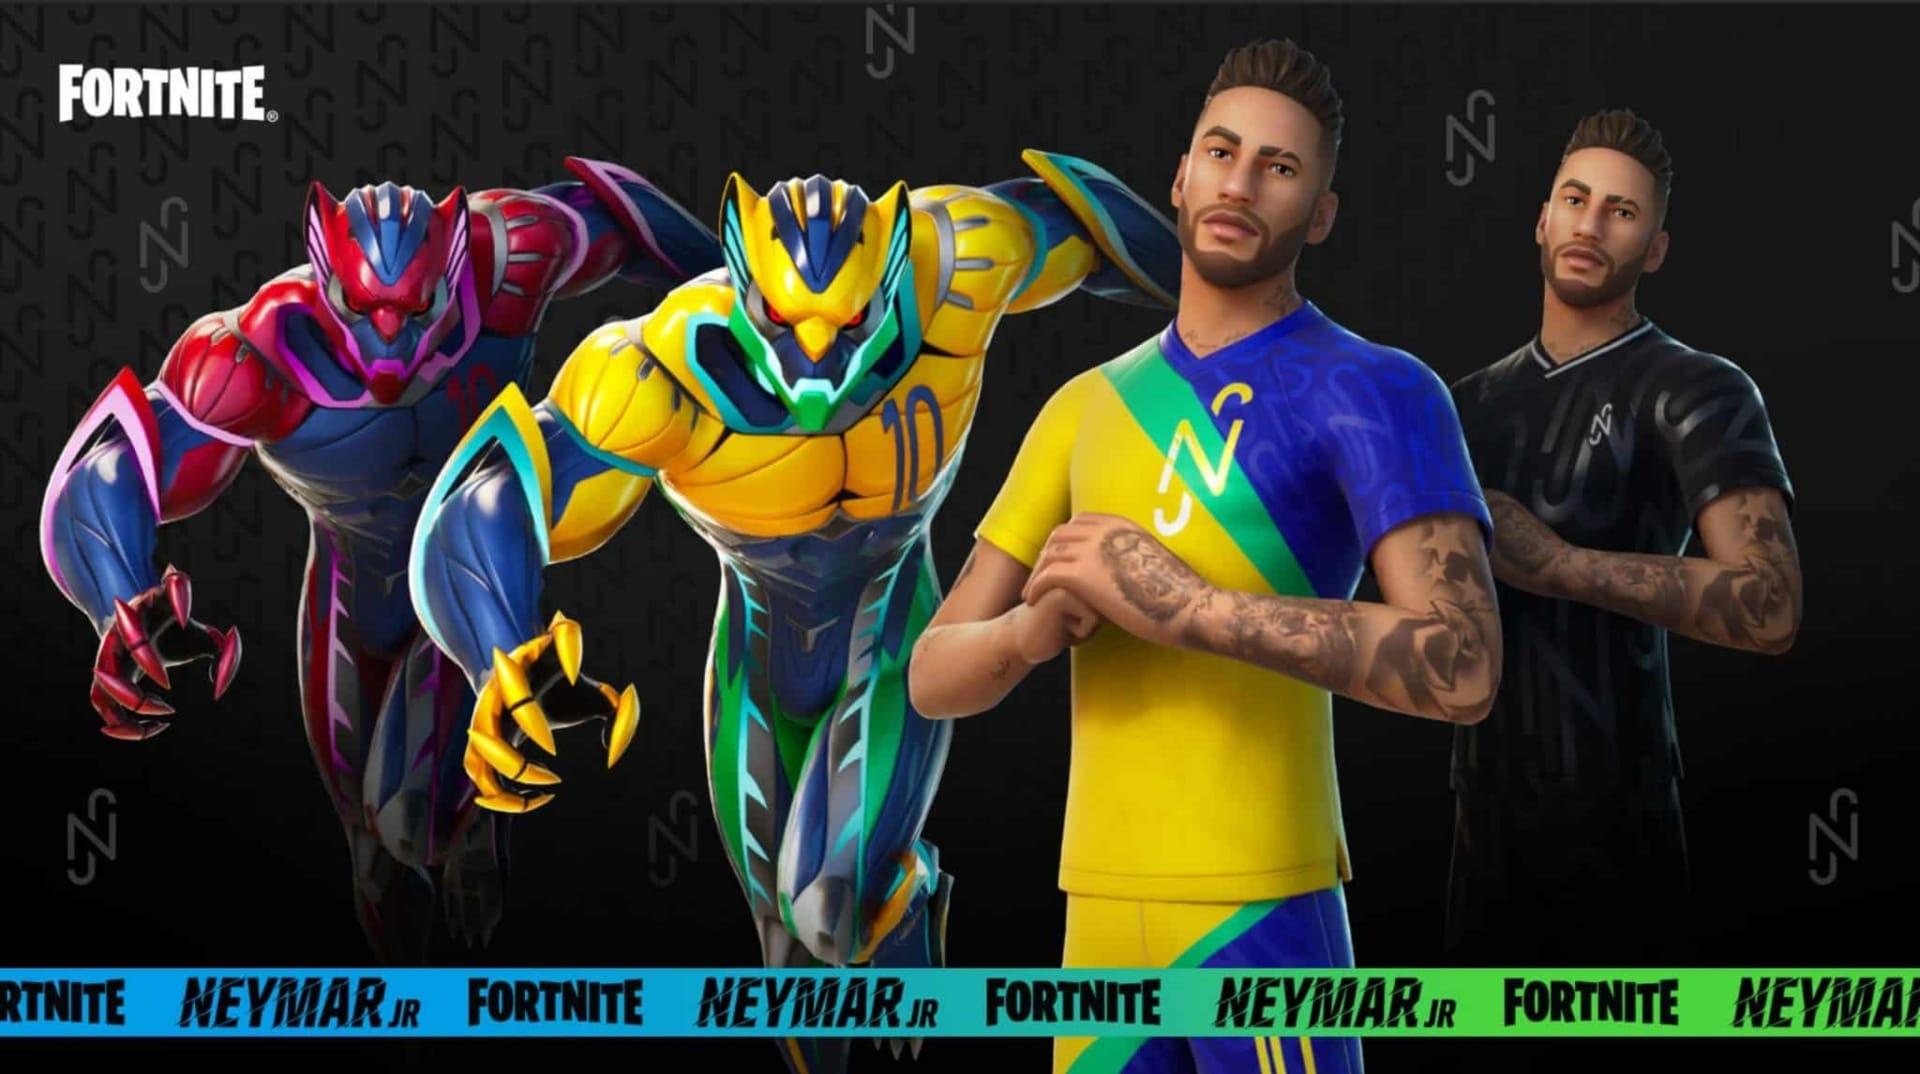 neymar-jr-fortnite-cosmetics-scaled (1)